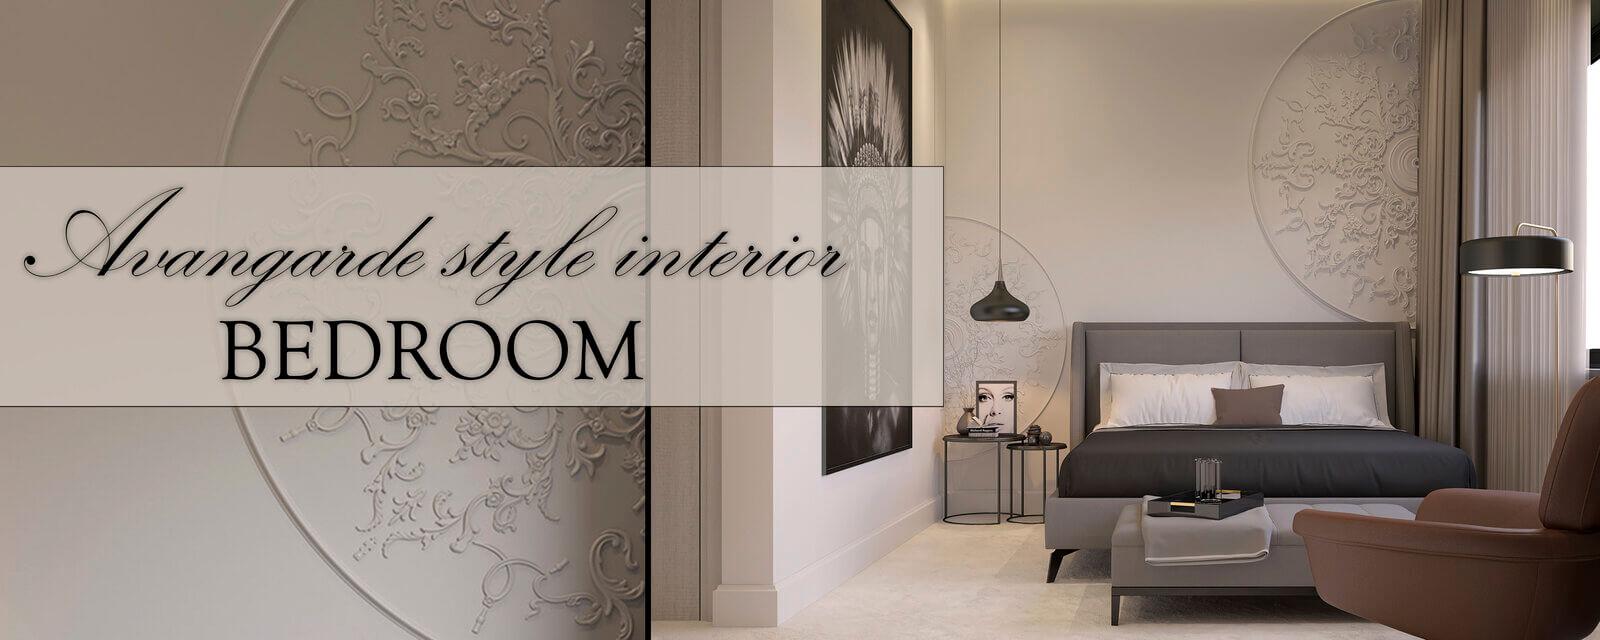 Avangard Style Interior | Bedroom